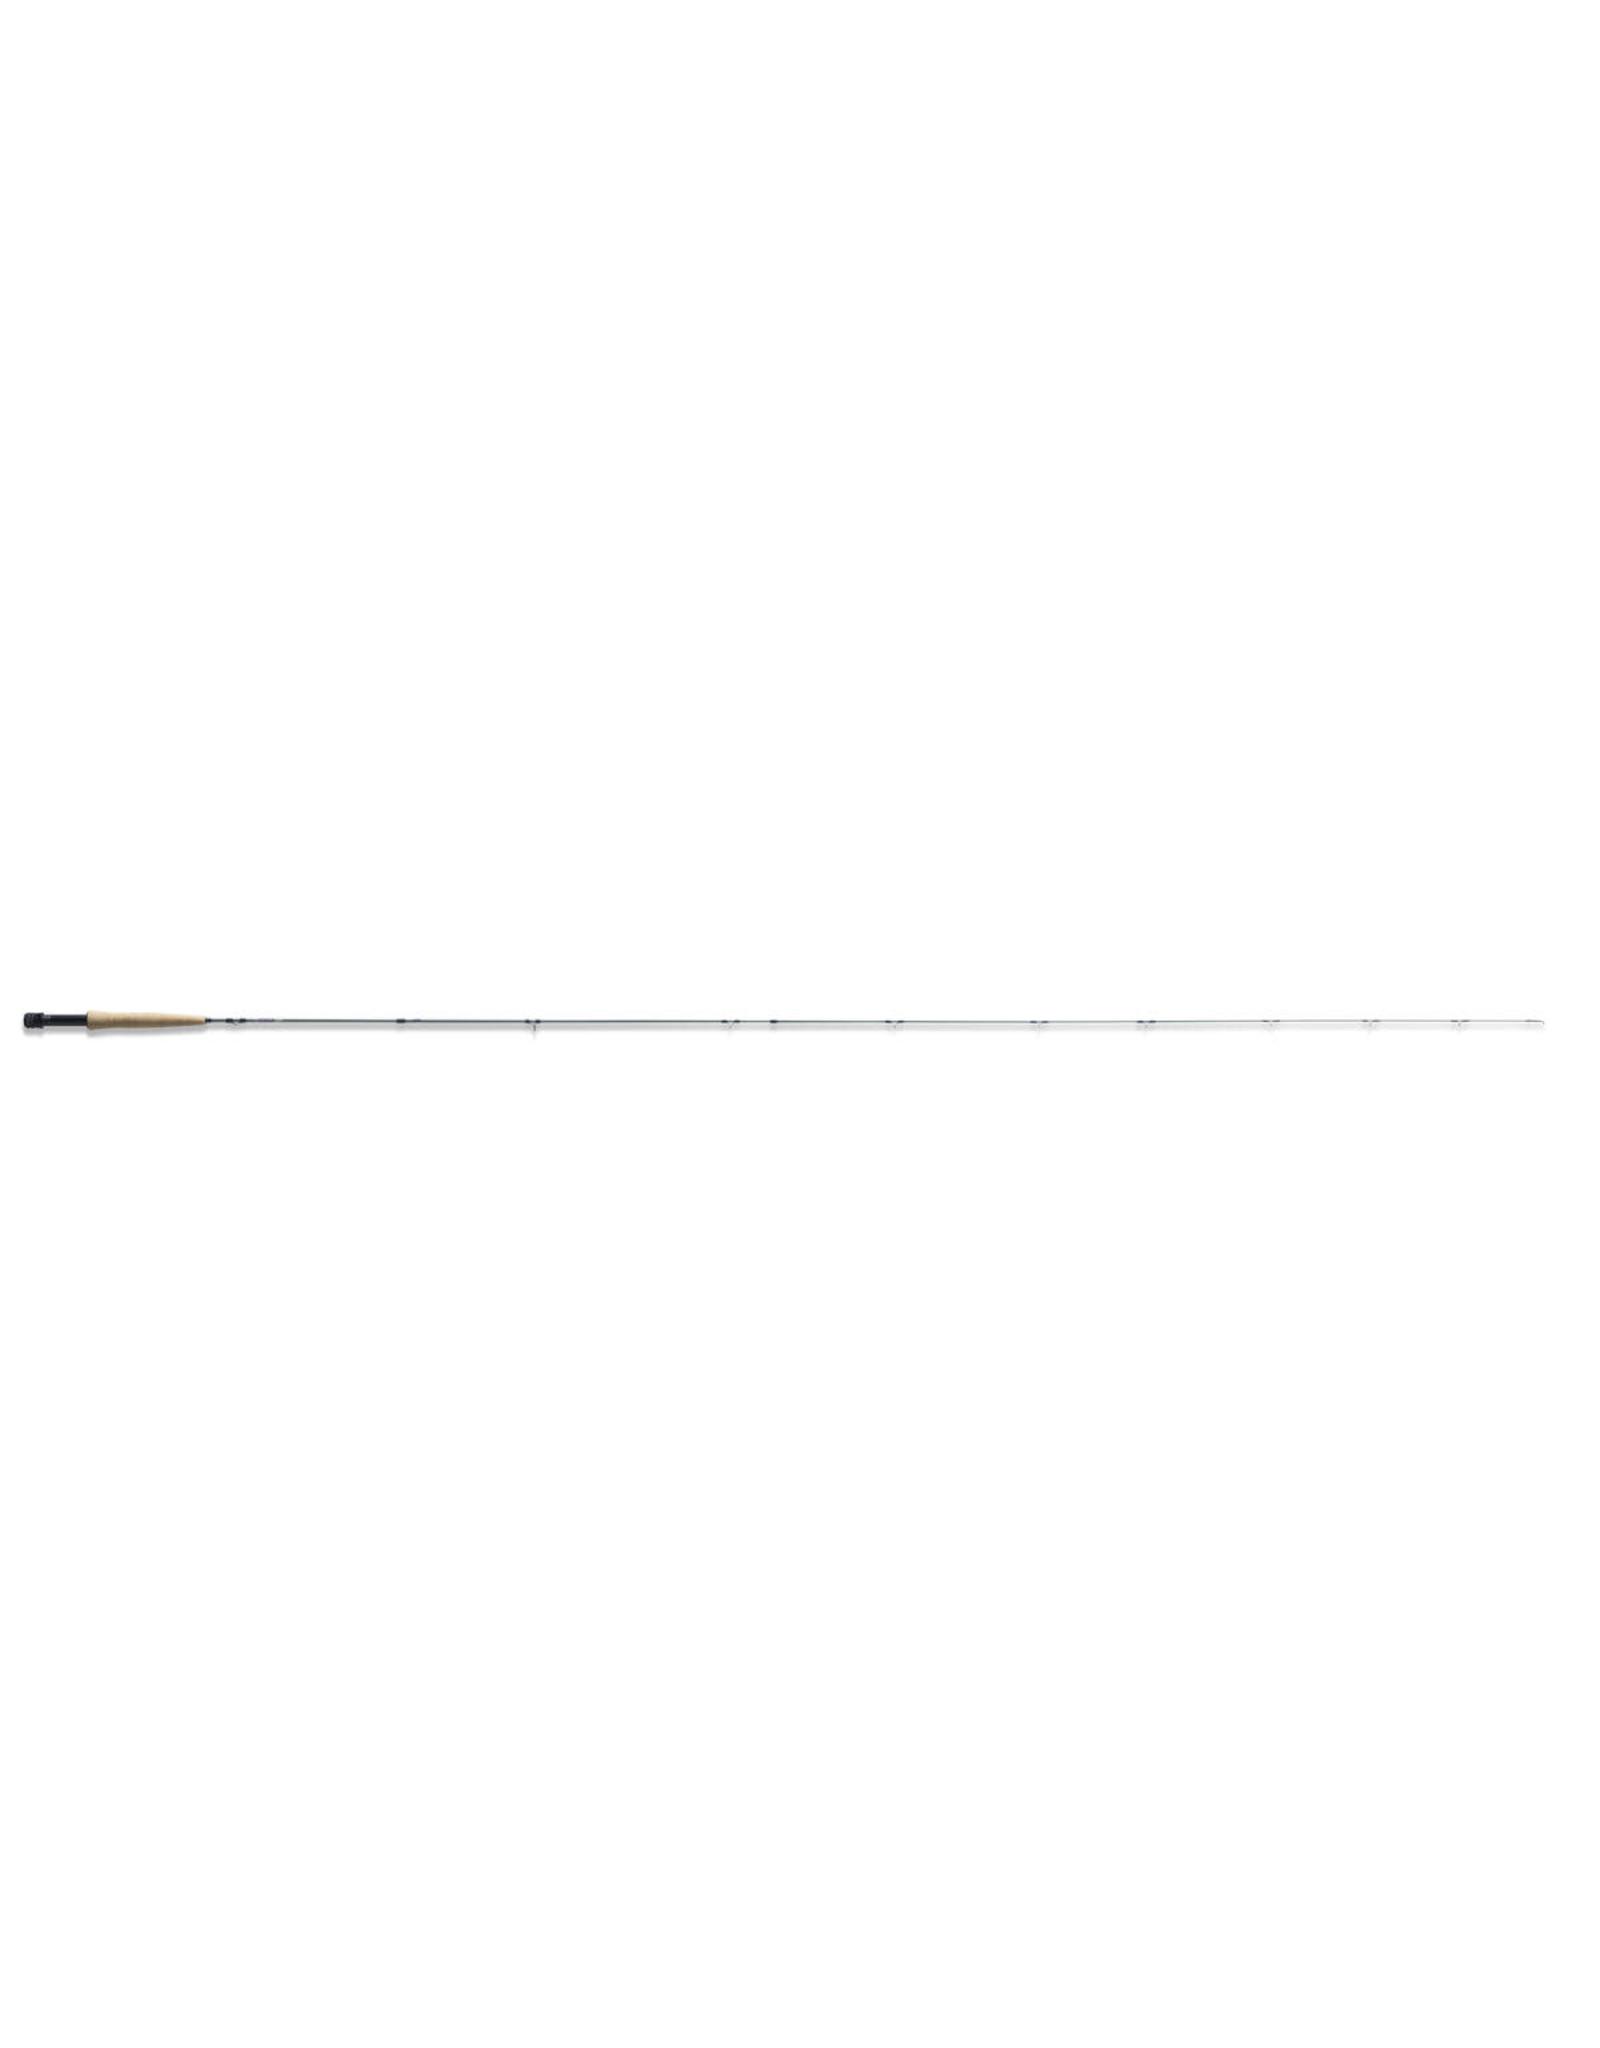 St. Croix St. Croix Mojo Trout Fly Rod